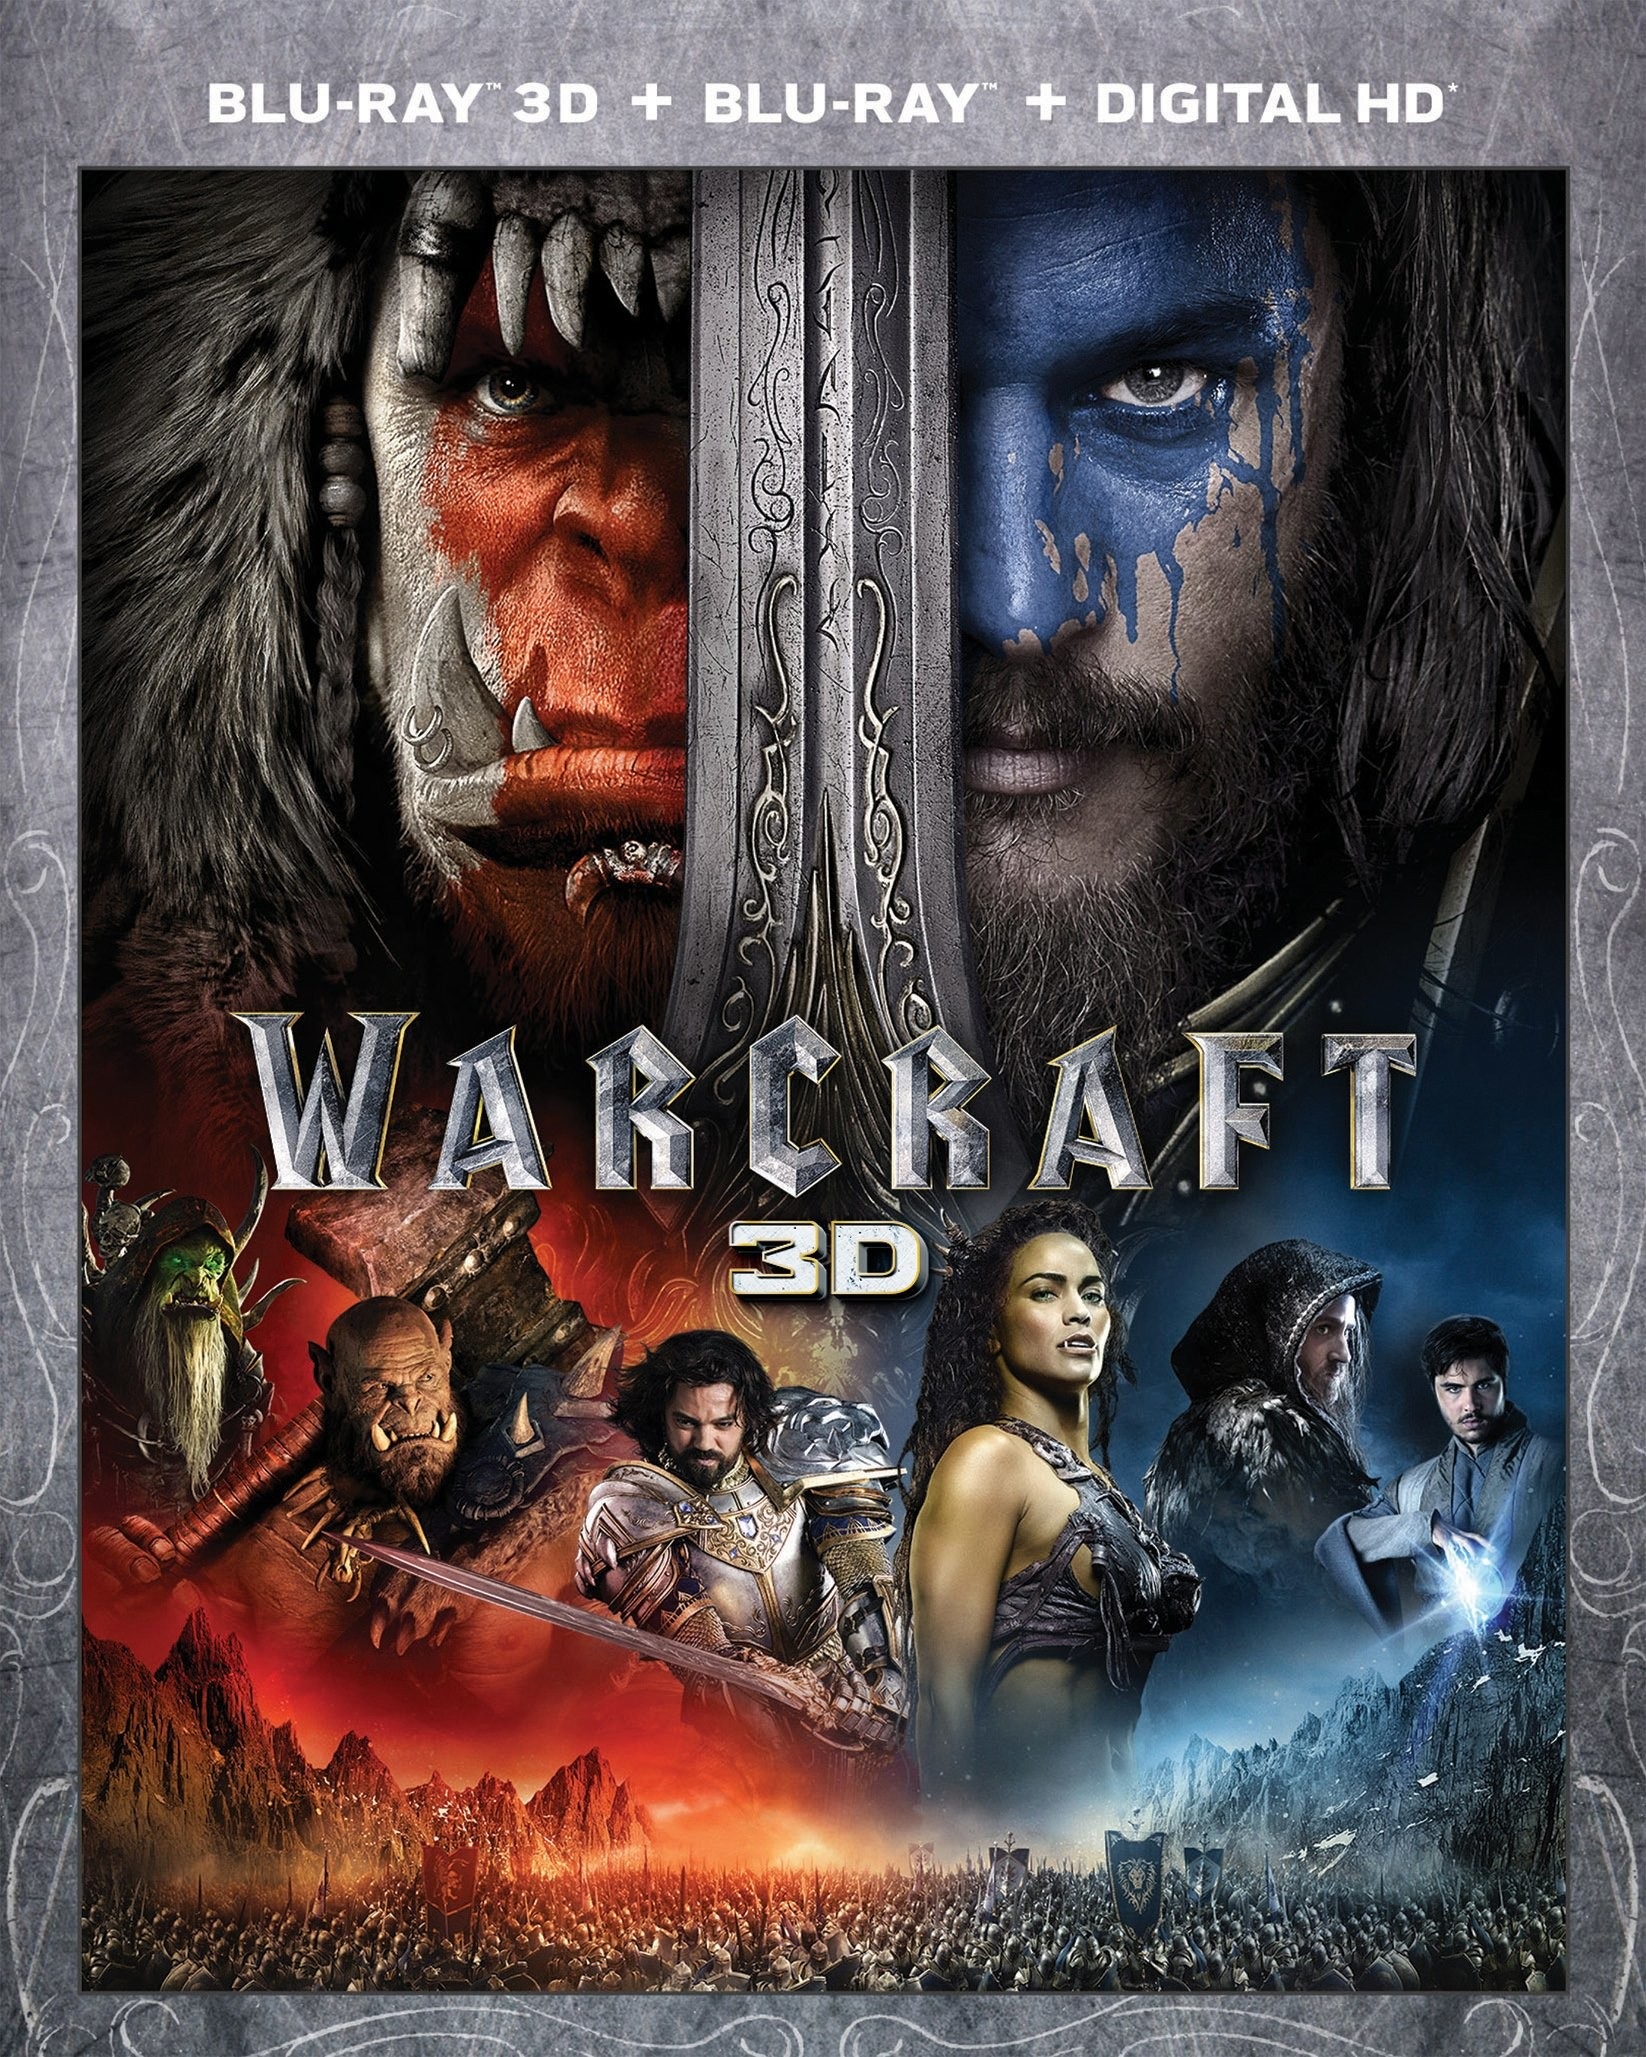 warcraft 3d poster indir